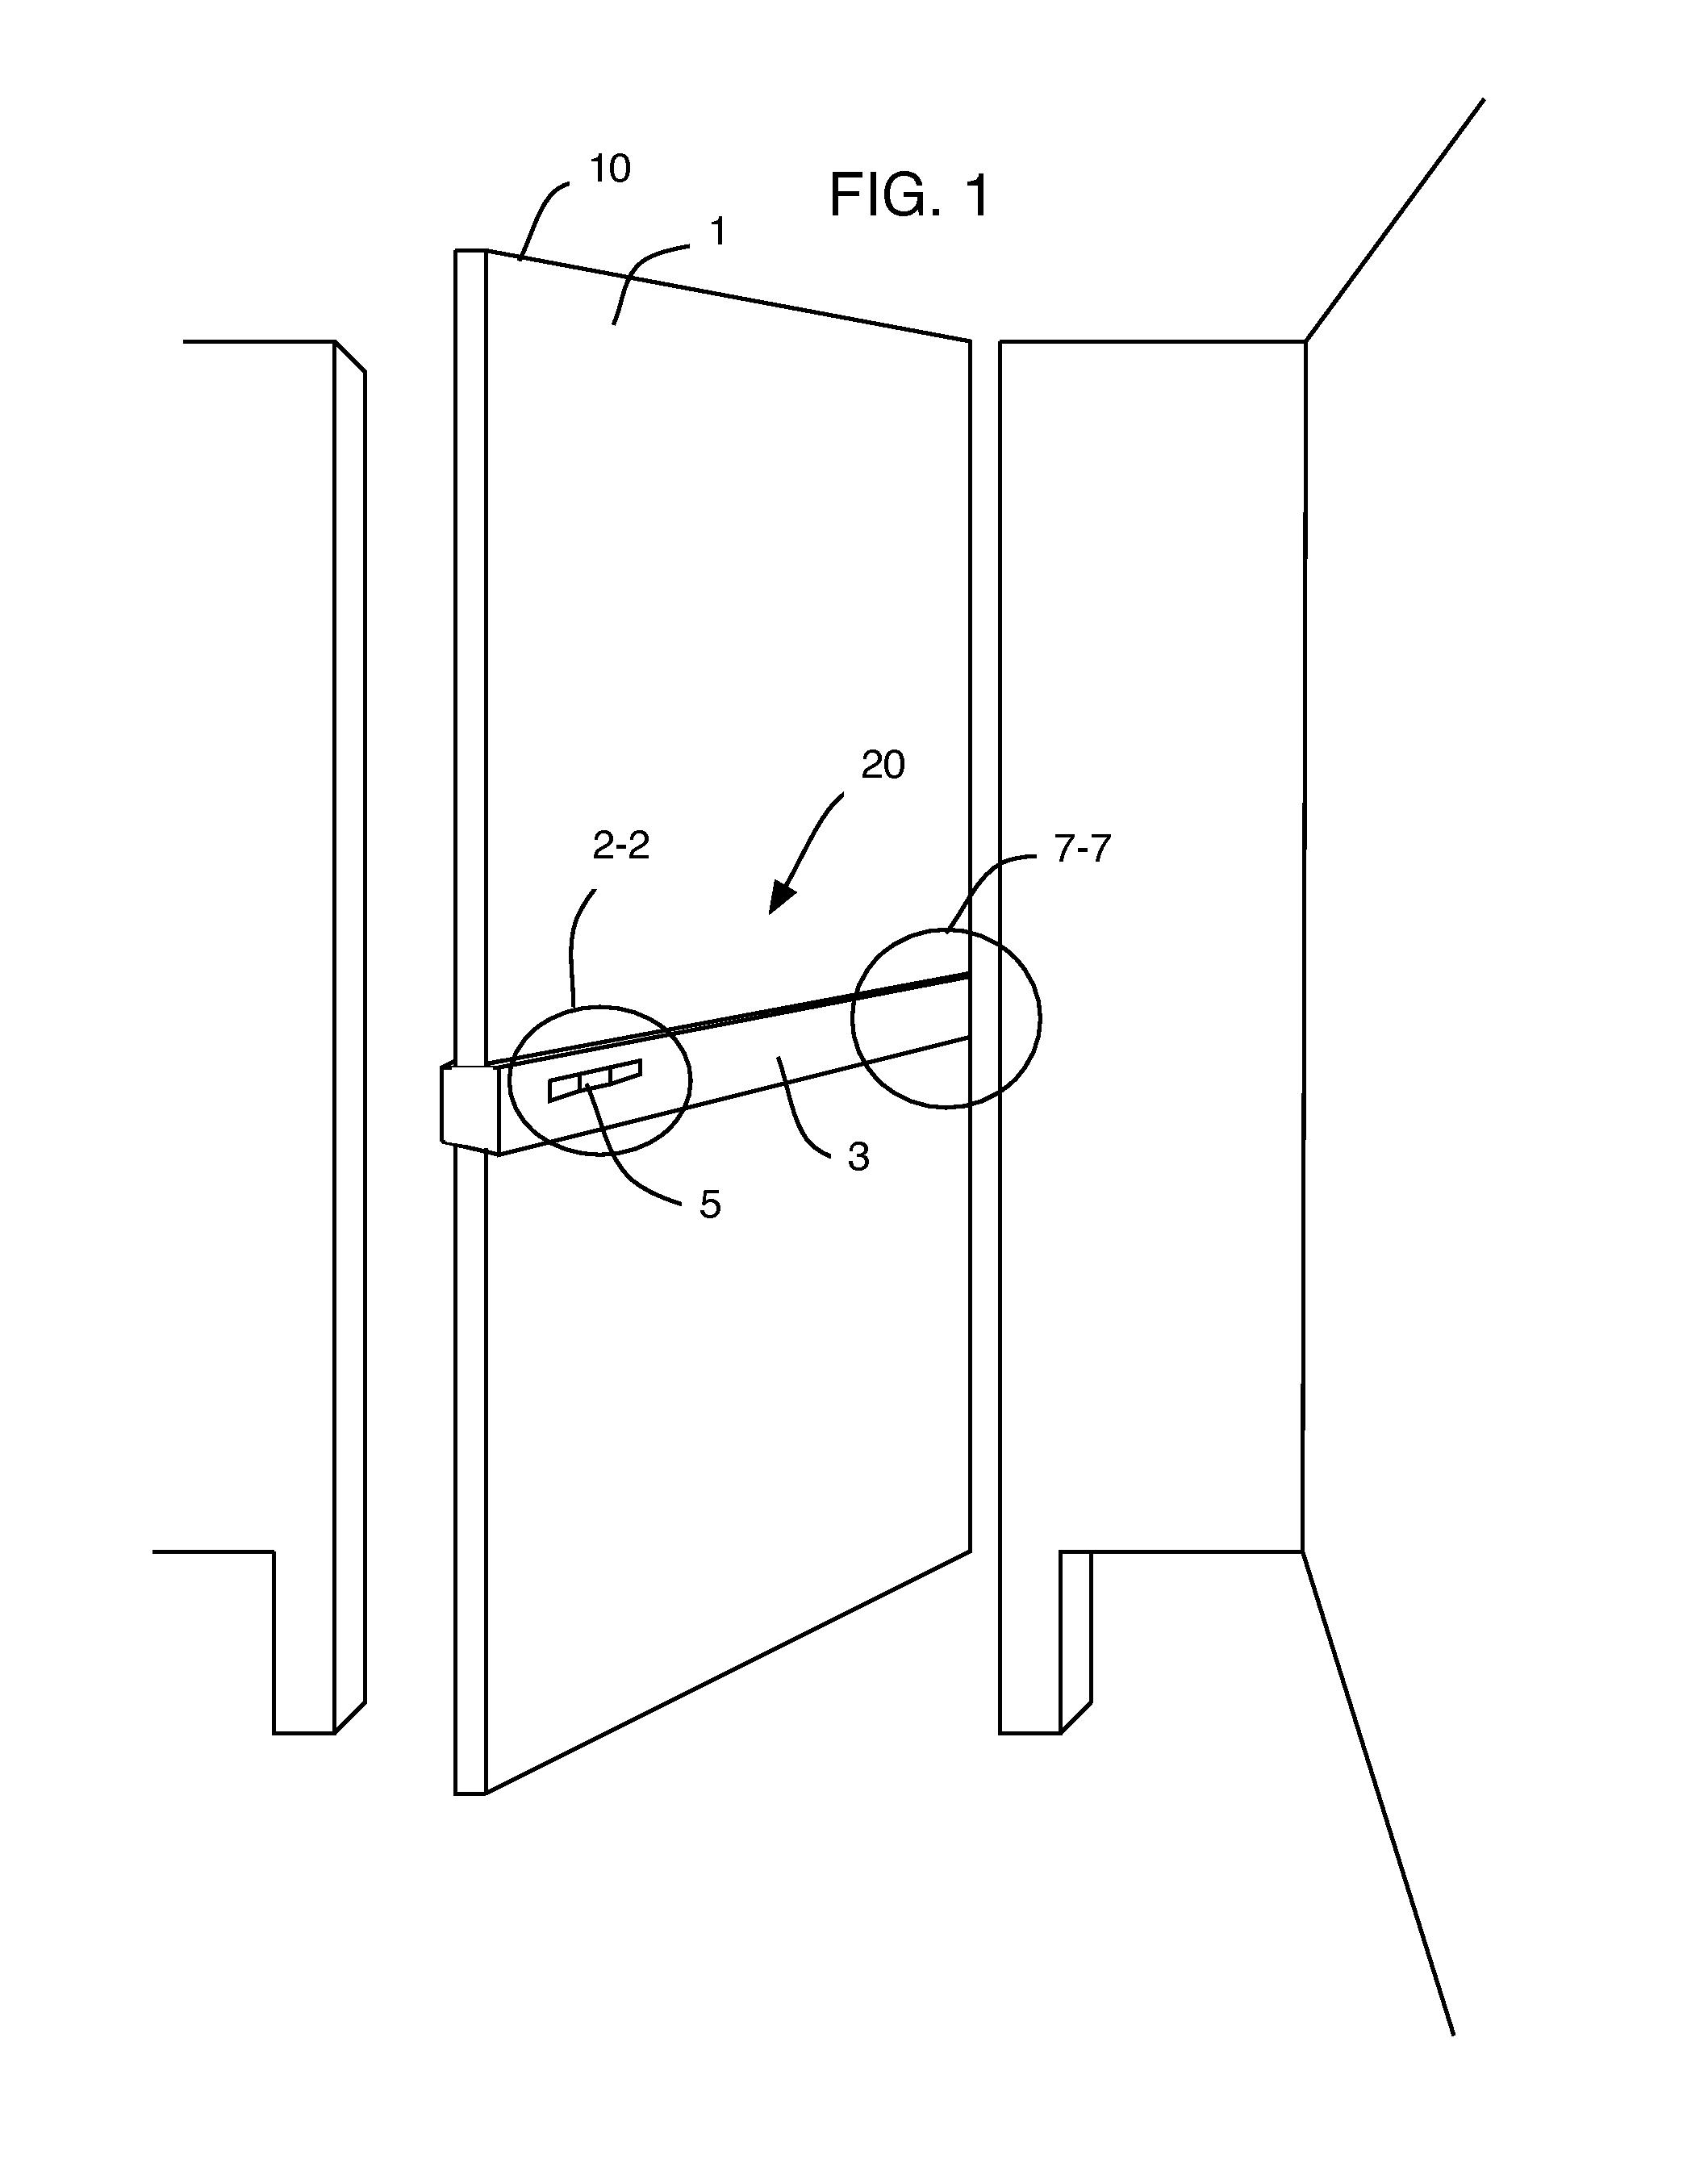 Bathroom stall door latch - Patent Drawing